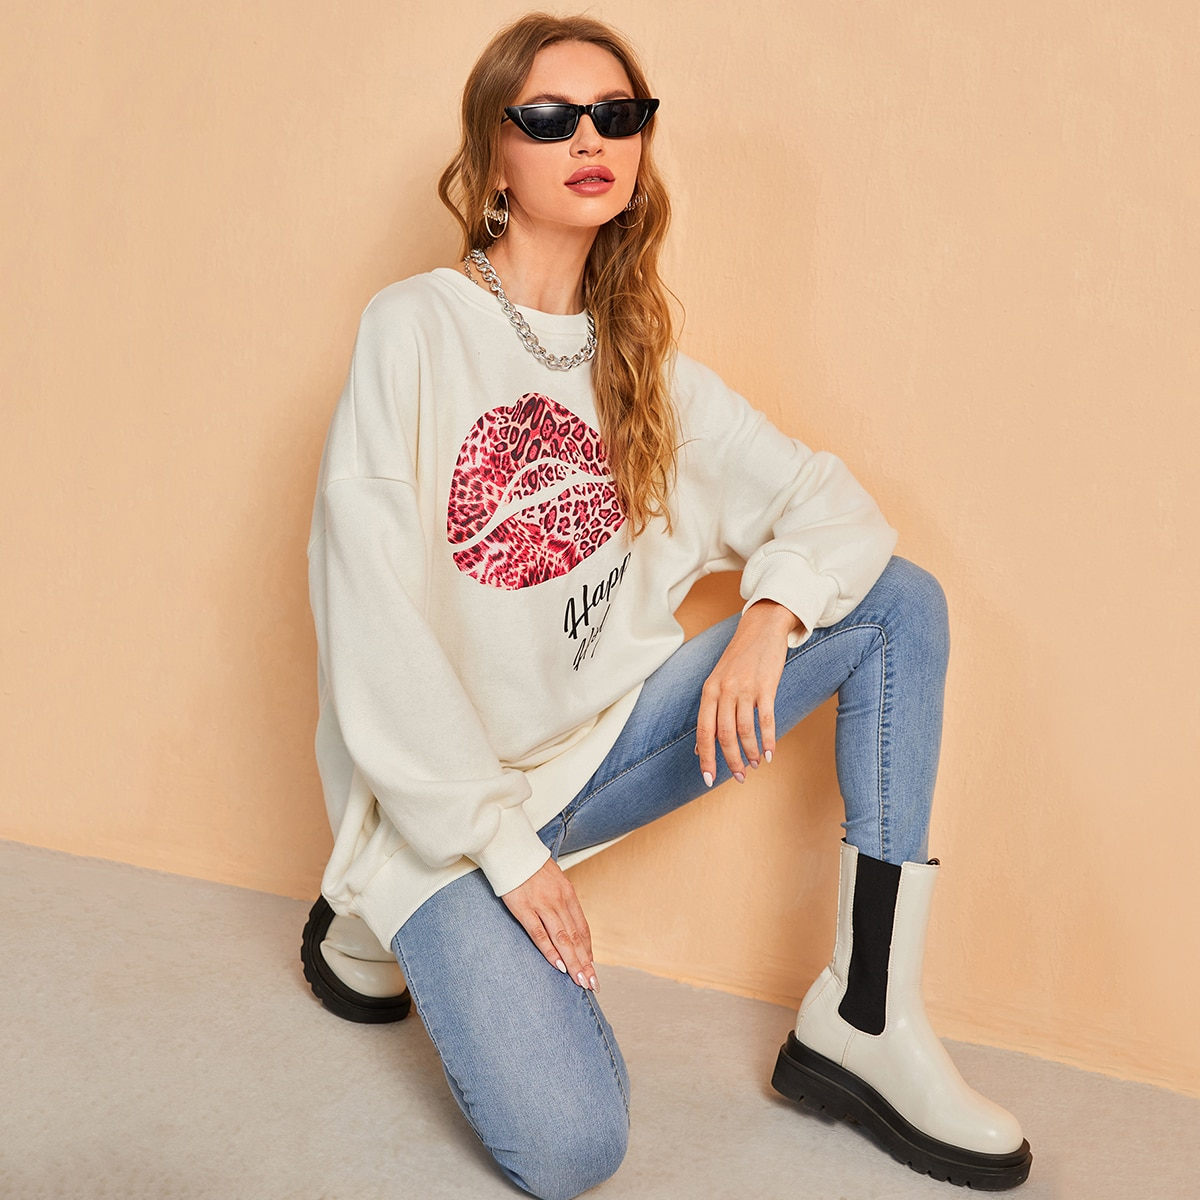 Lip & Letter Graphic Drop Shoulder Sweatshirt, SHEIN  - buy with discount